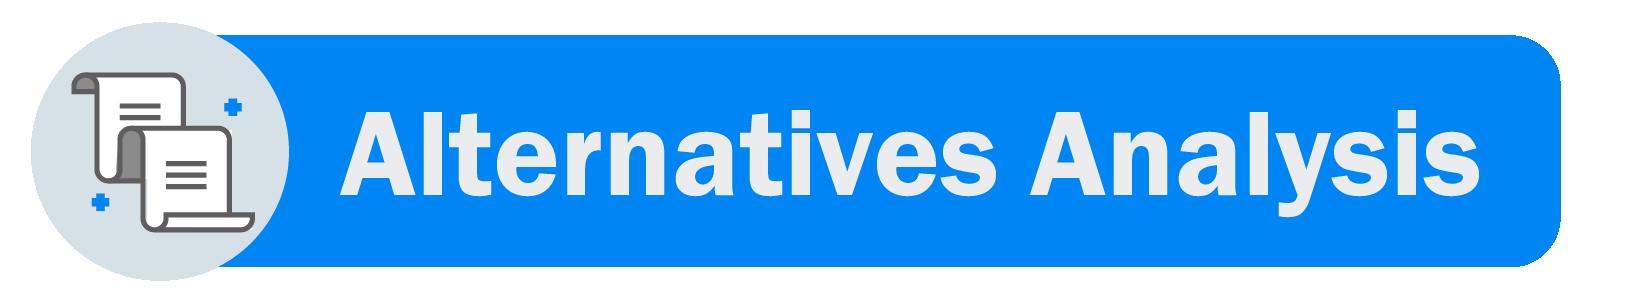 Alternatives Analysis Matrix